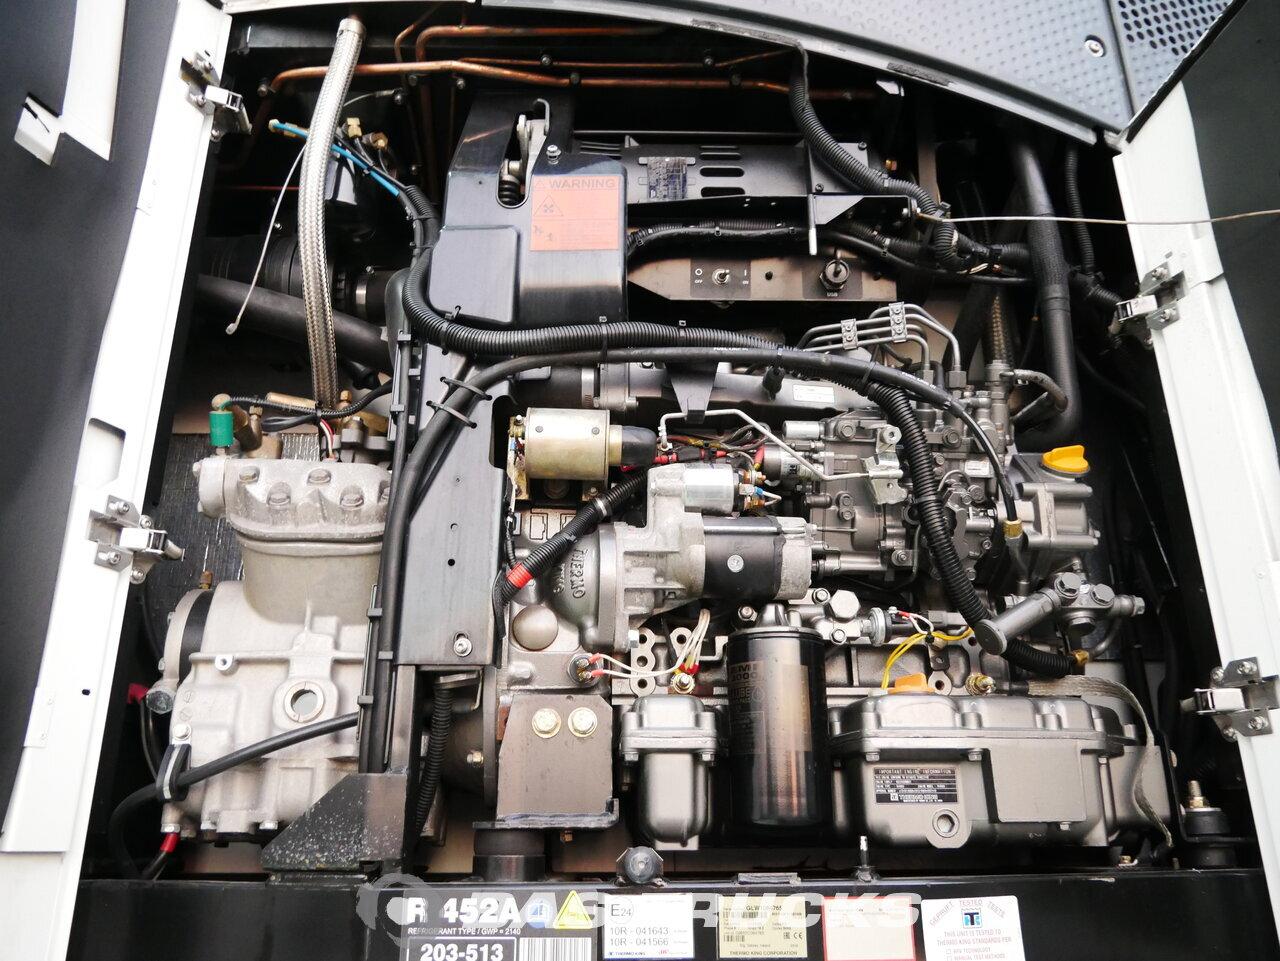 foto di Usato Semirimorchio Schmitz Doppelstock Thermoking SLXe 300 2804 Hours Palettenkasten SCB*S3B assi 2016